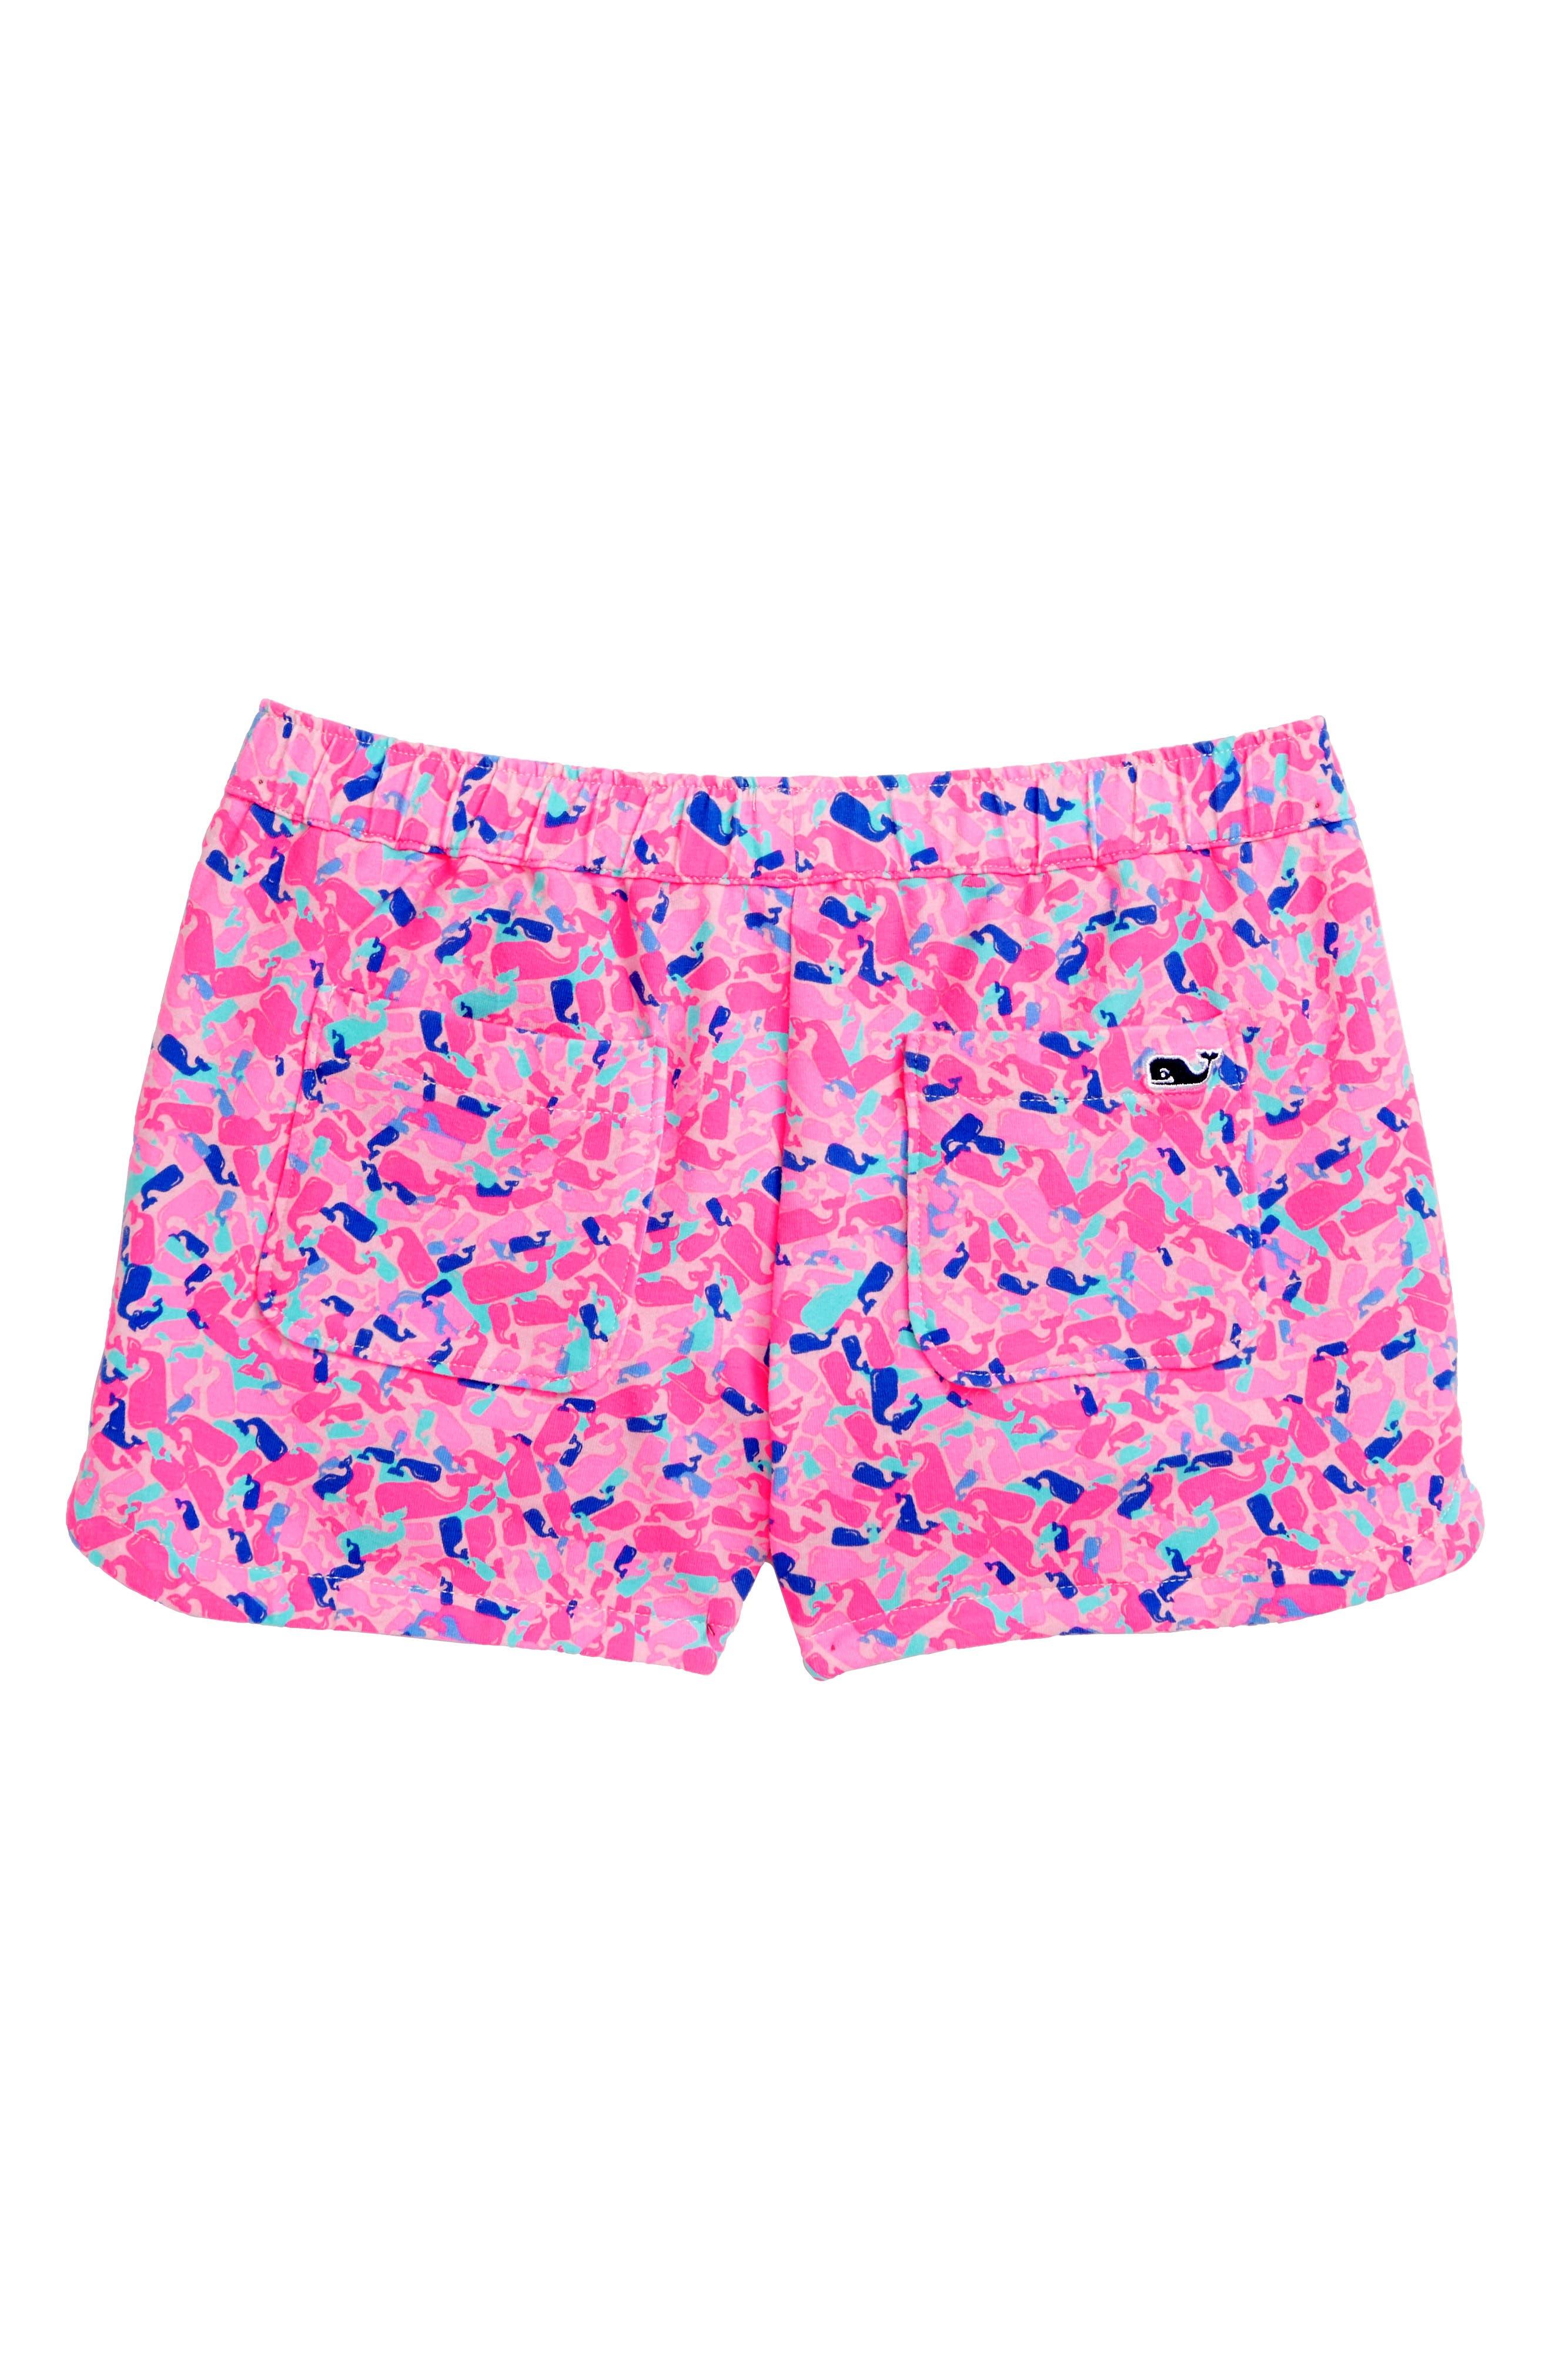 Whale Swirl Shorts,                             Alternate thumbnail 2, color,                             MALIBU PINK